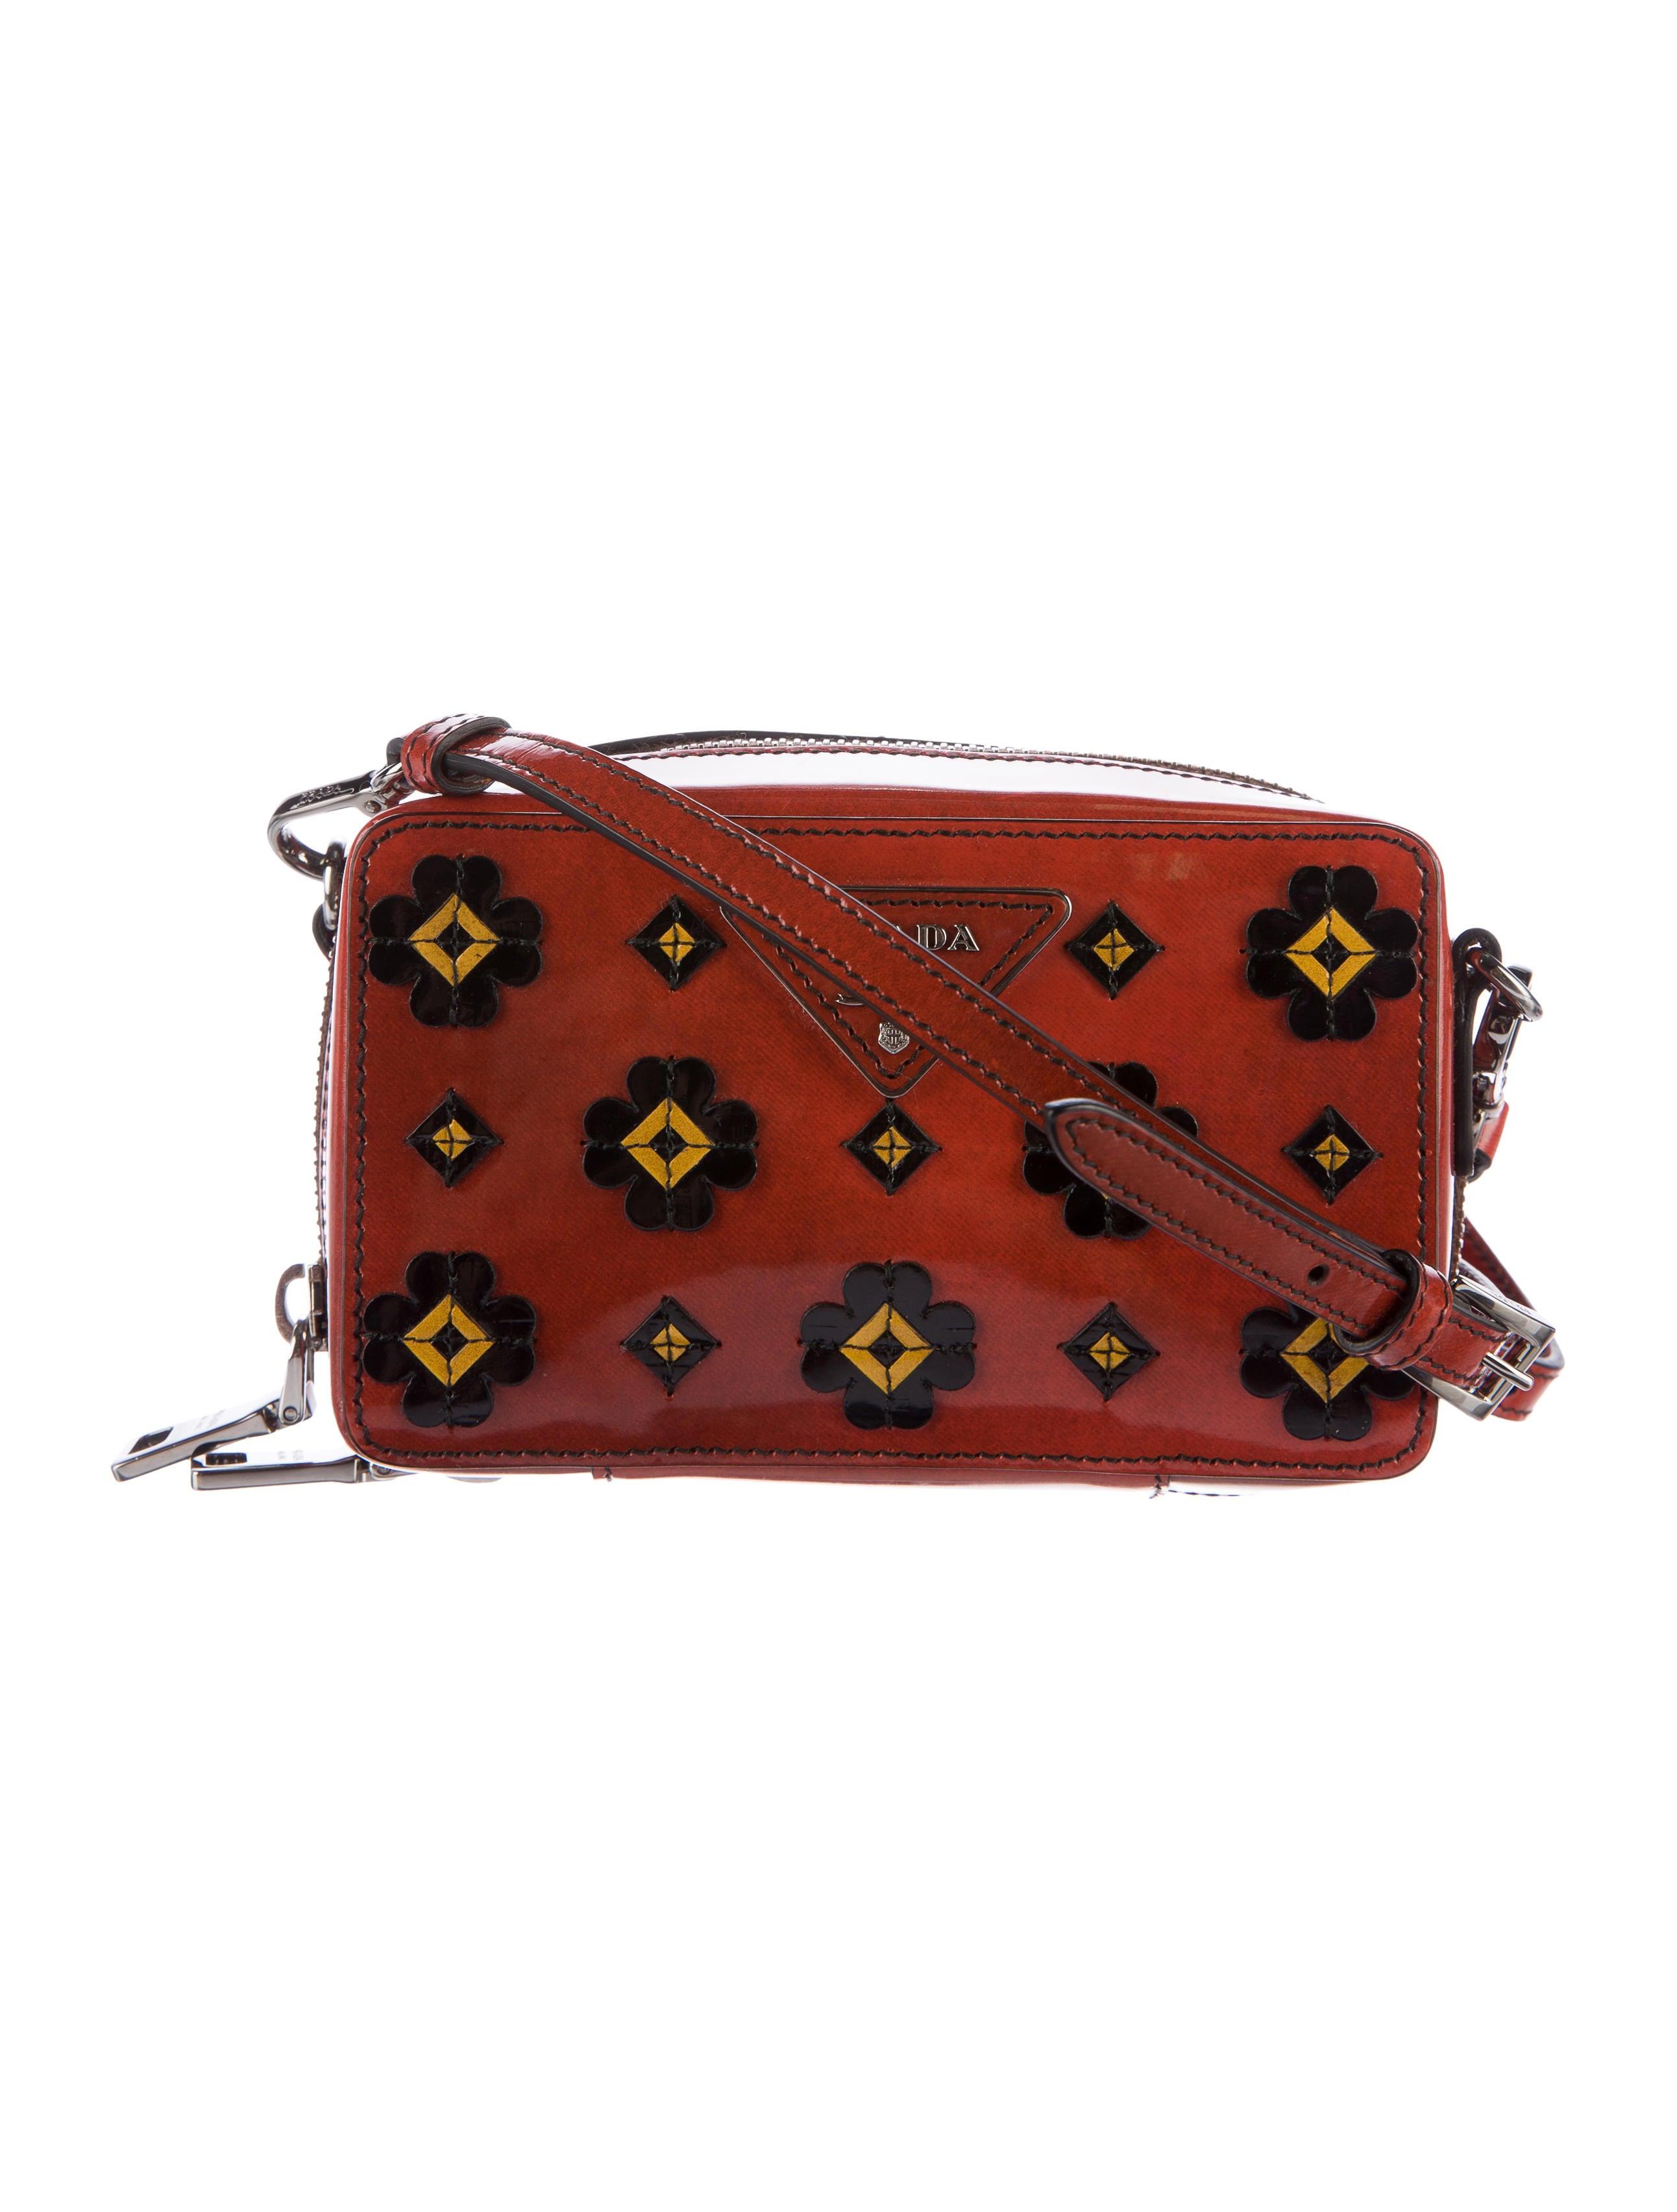 Prada Patent Leather Floral Crossbody Bag - Handbags - PRA142792 | The RealReal